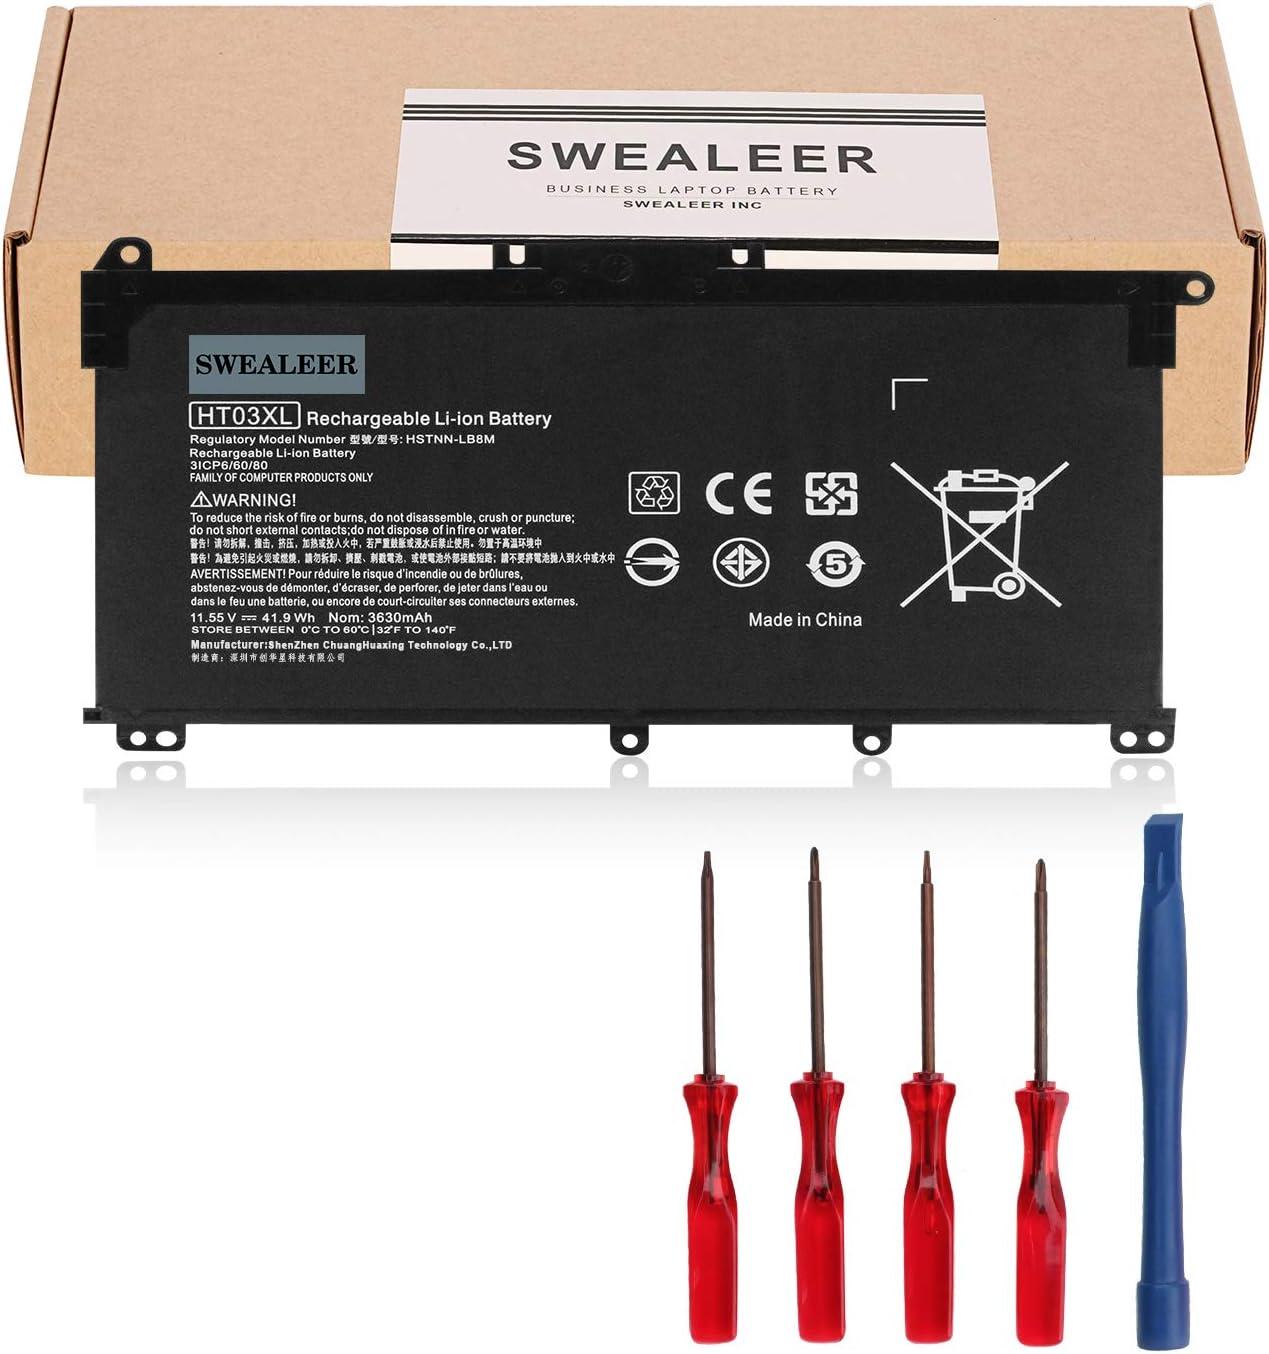 SWEALEER HT03XL Laptop Battery Compatible with HP Pavilion 14-CE0025TU 14-CE0034TX 15-CS0037T 250 255 G7 HSTNN-LB8L L11421-421 HSTNN-LB8M HSTNN-DB8R[11.55V 41.9Wh 3630mAh HT03XL]